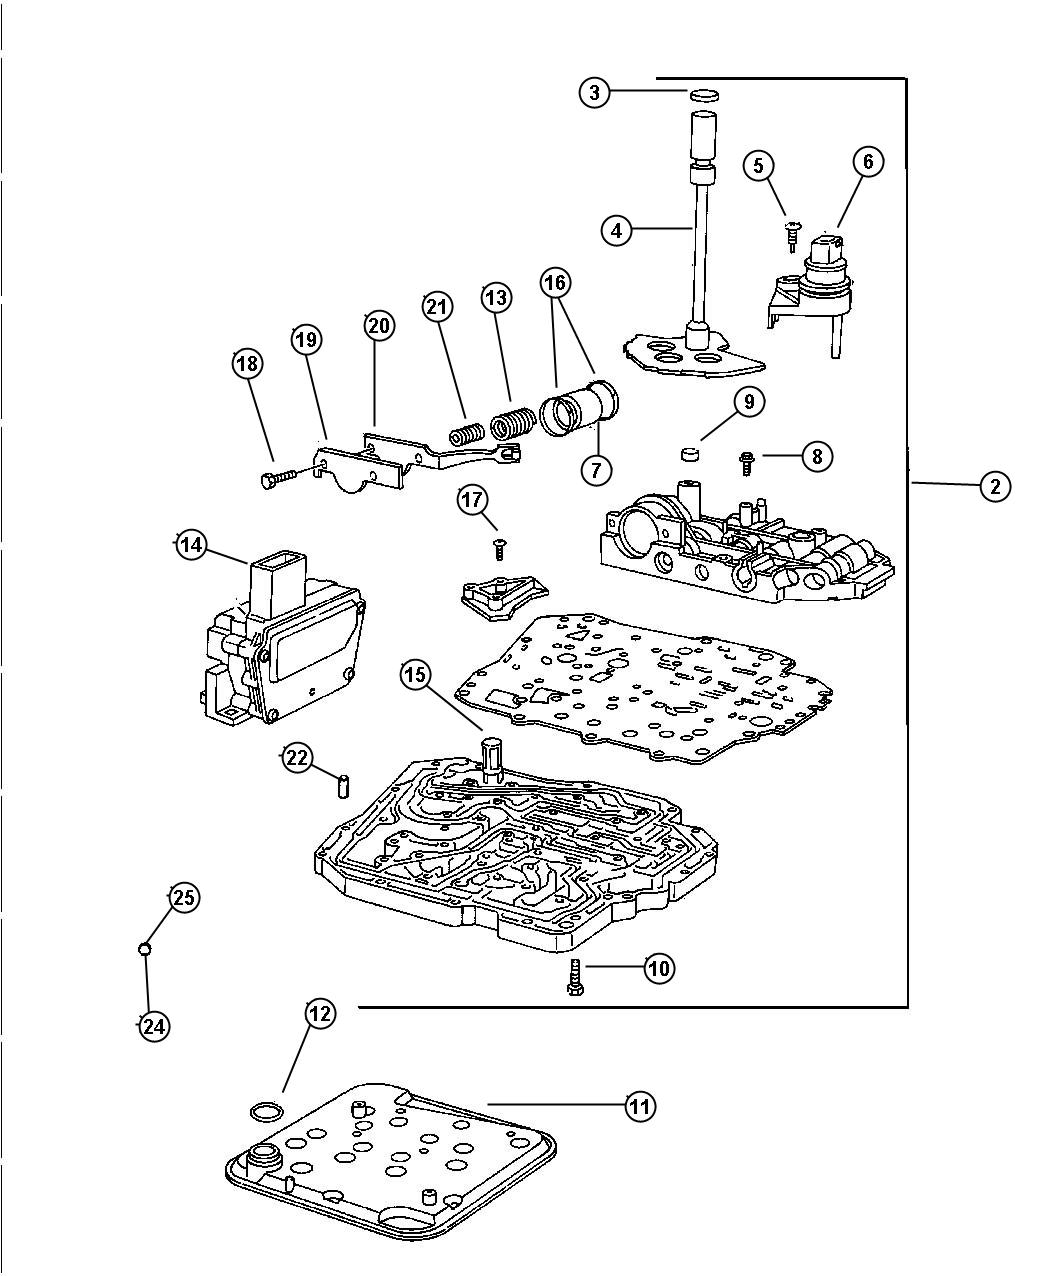 dodge 42re transmission exploded view diagram 2001 dodge